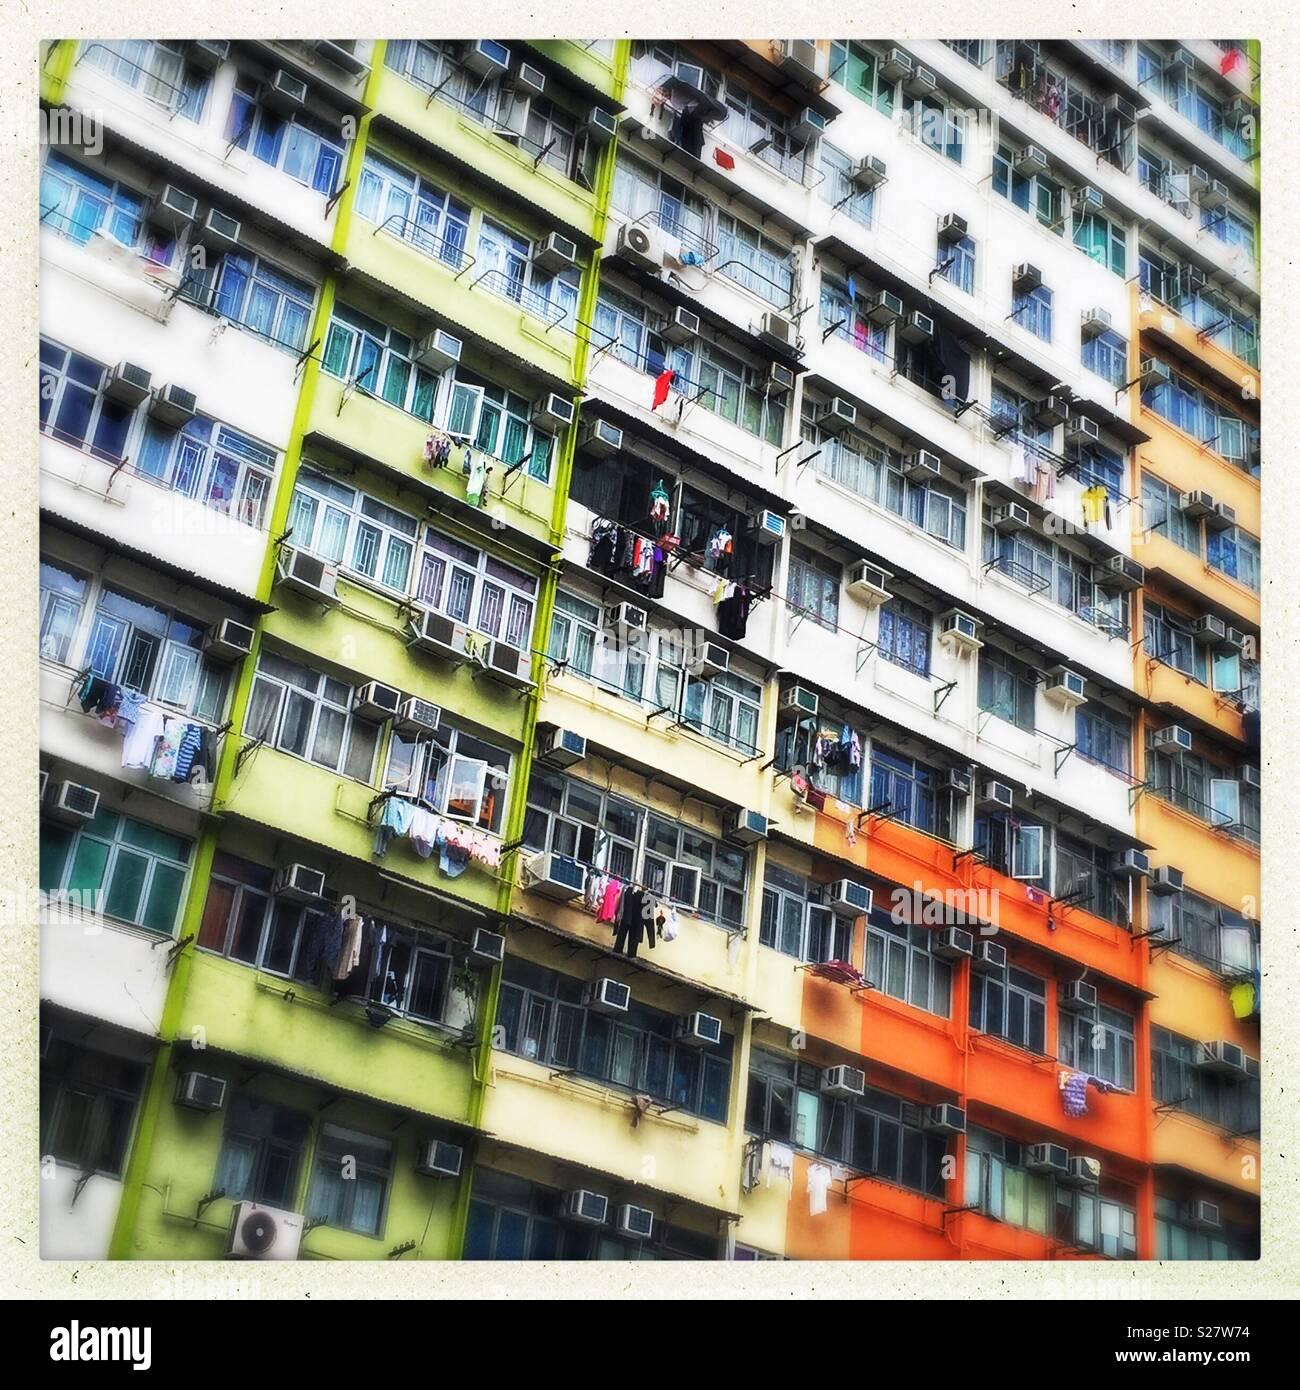 Older style apartment block in To Kwa Wan, Kowloon, Hong Kong - Stock Image